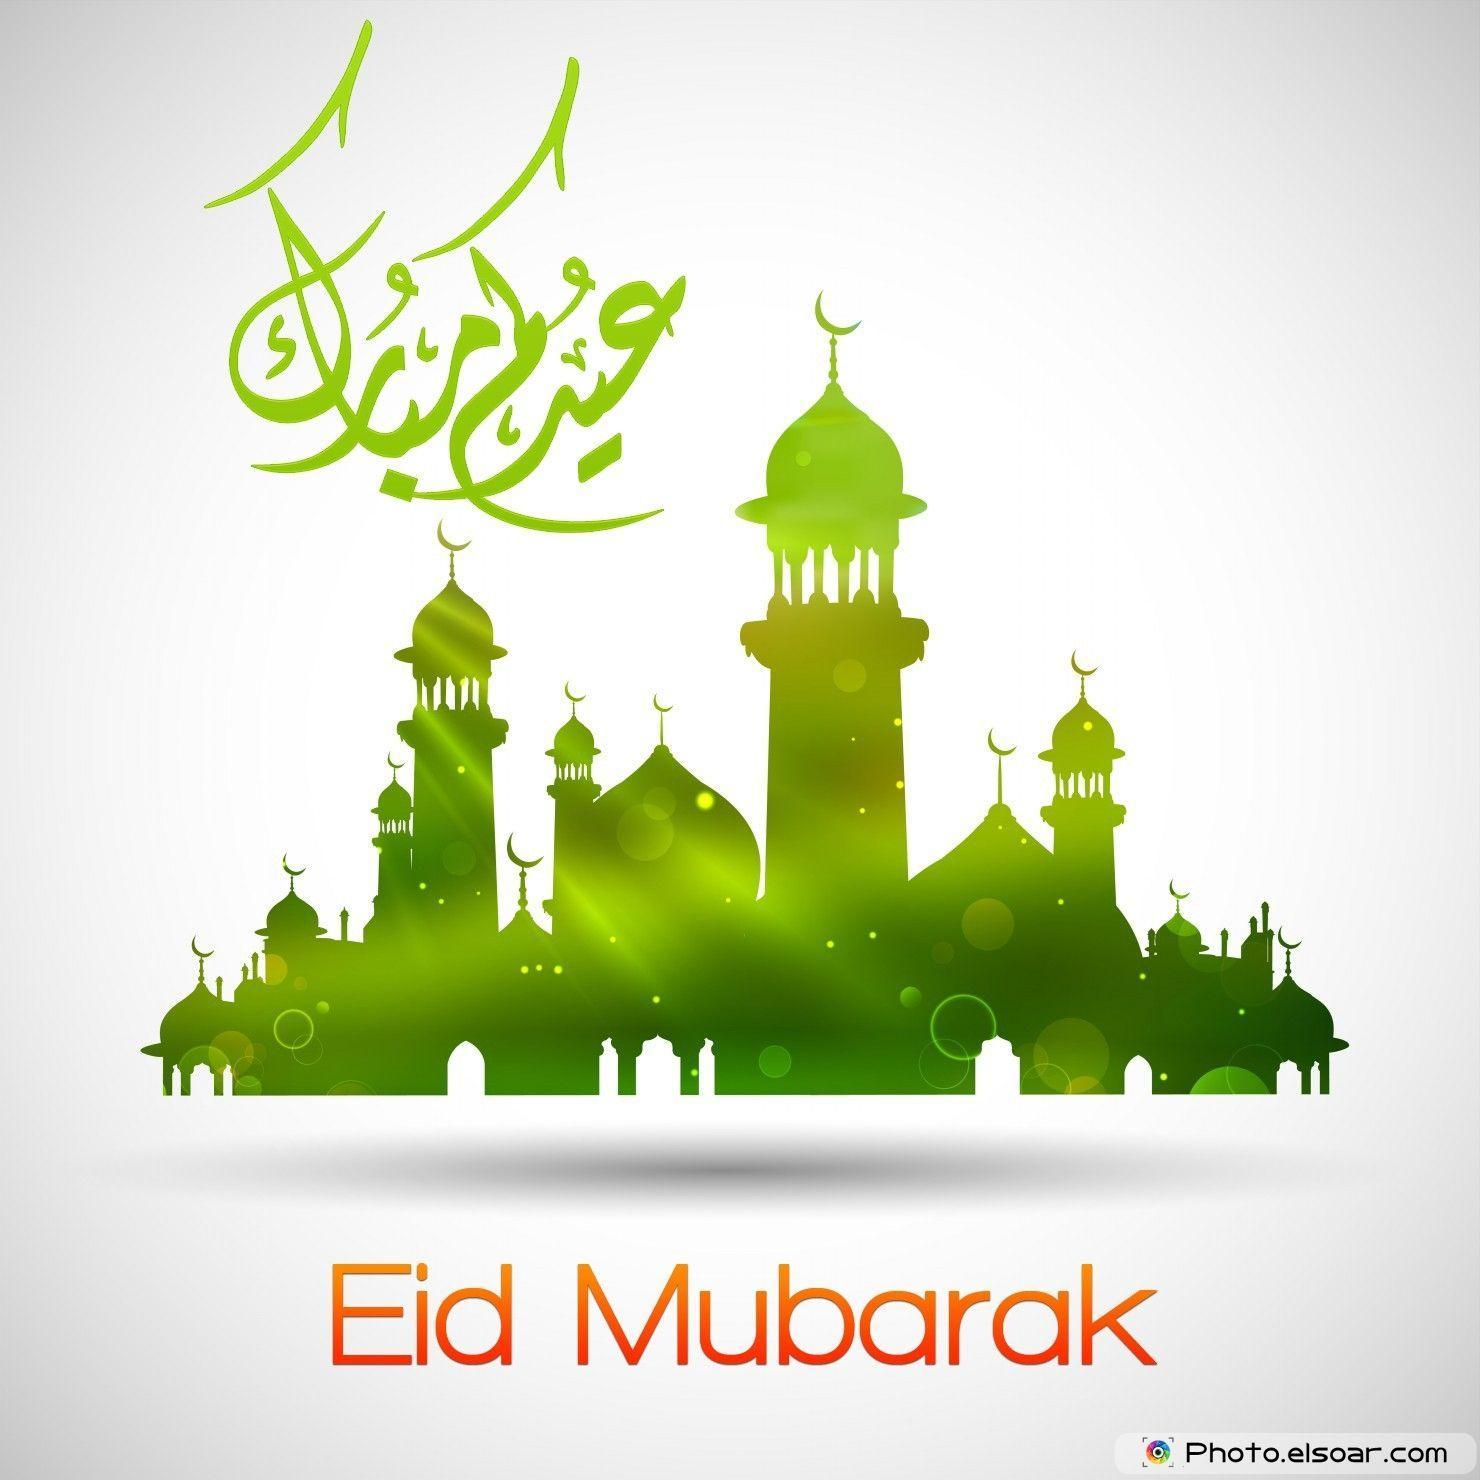 Eid Mubarak Wallpapers Wallpaper Cave